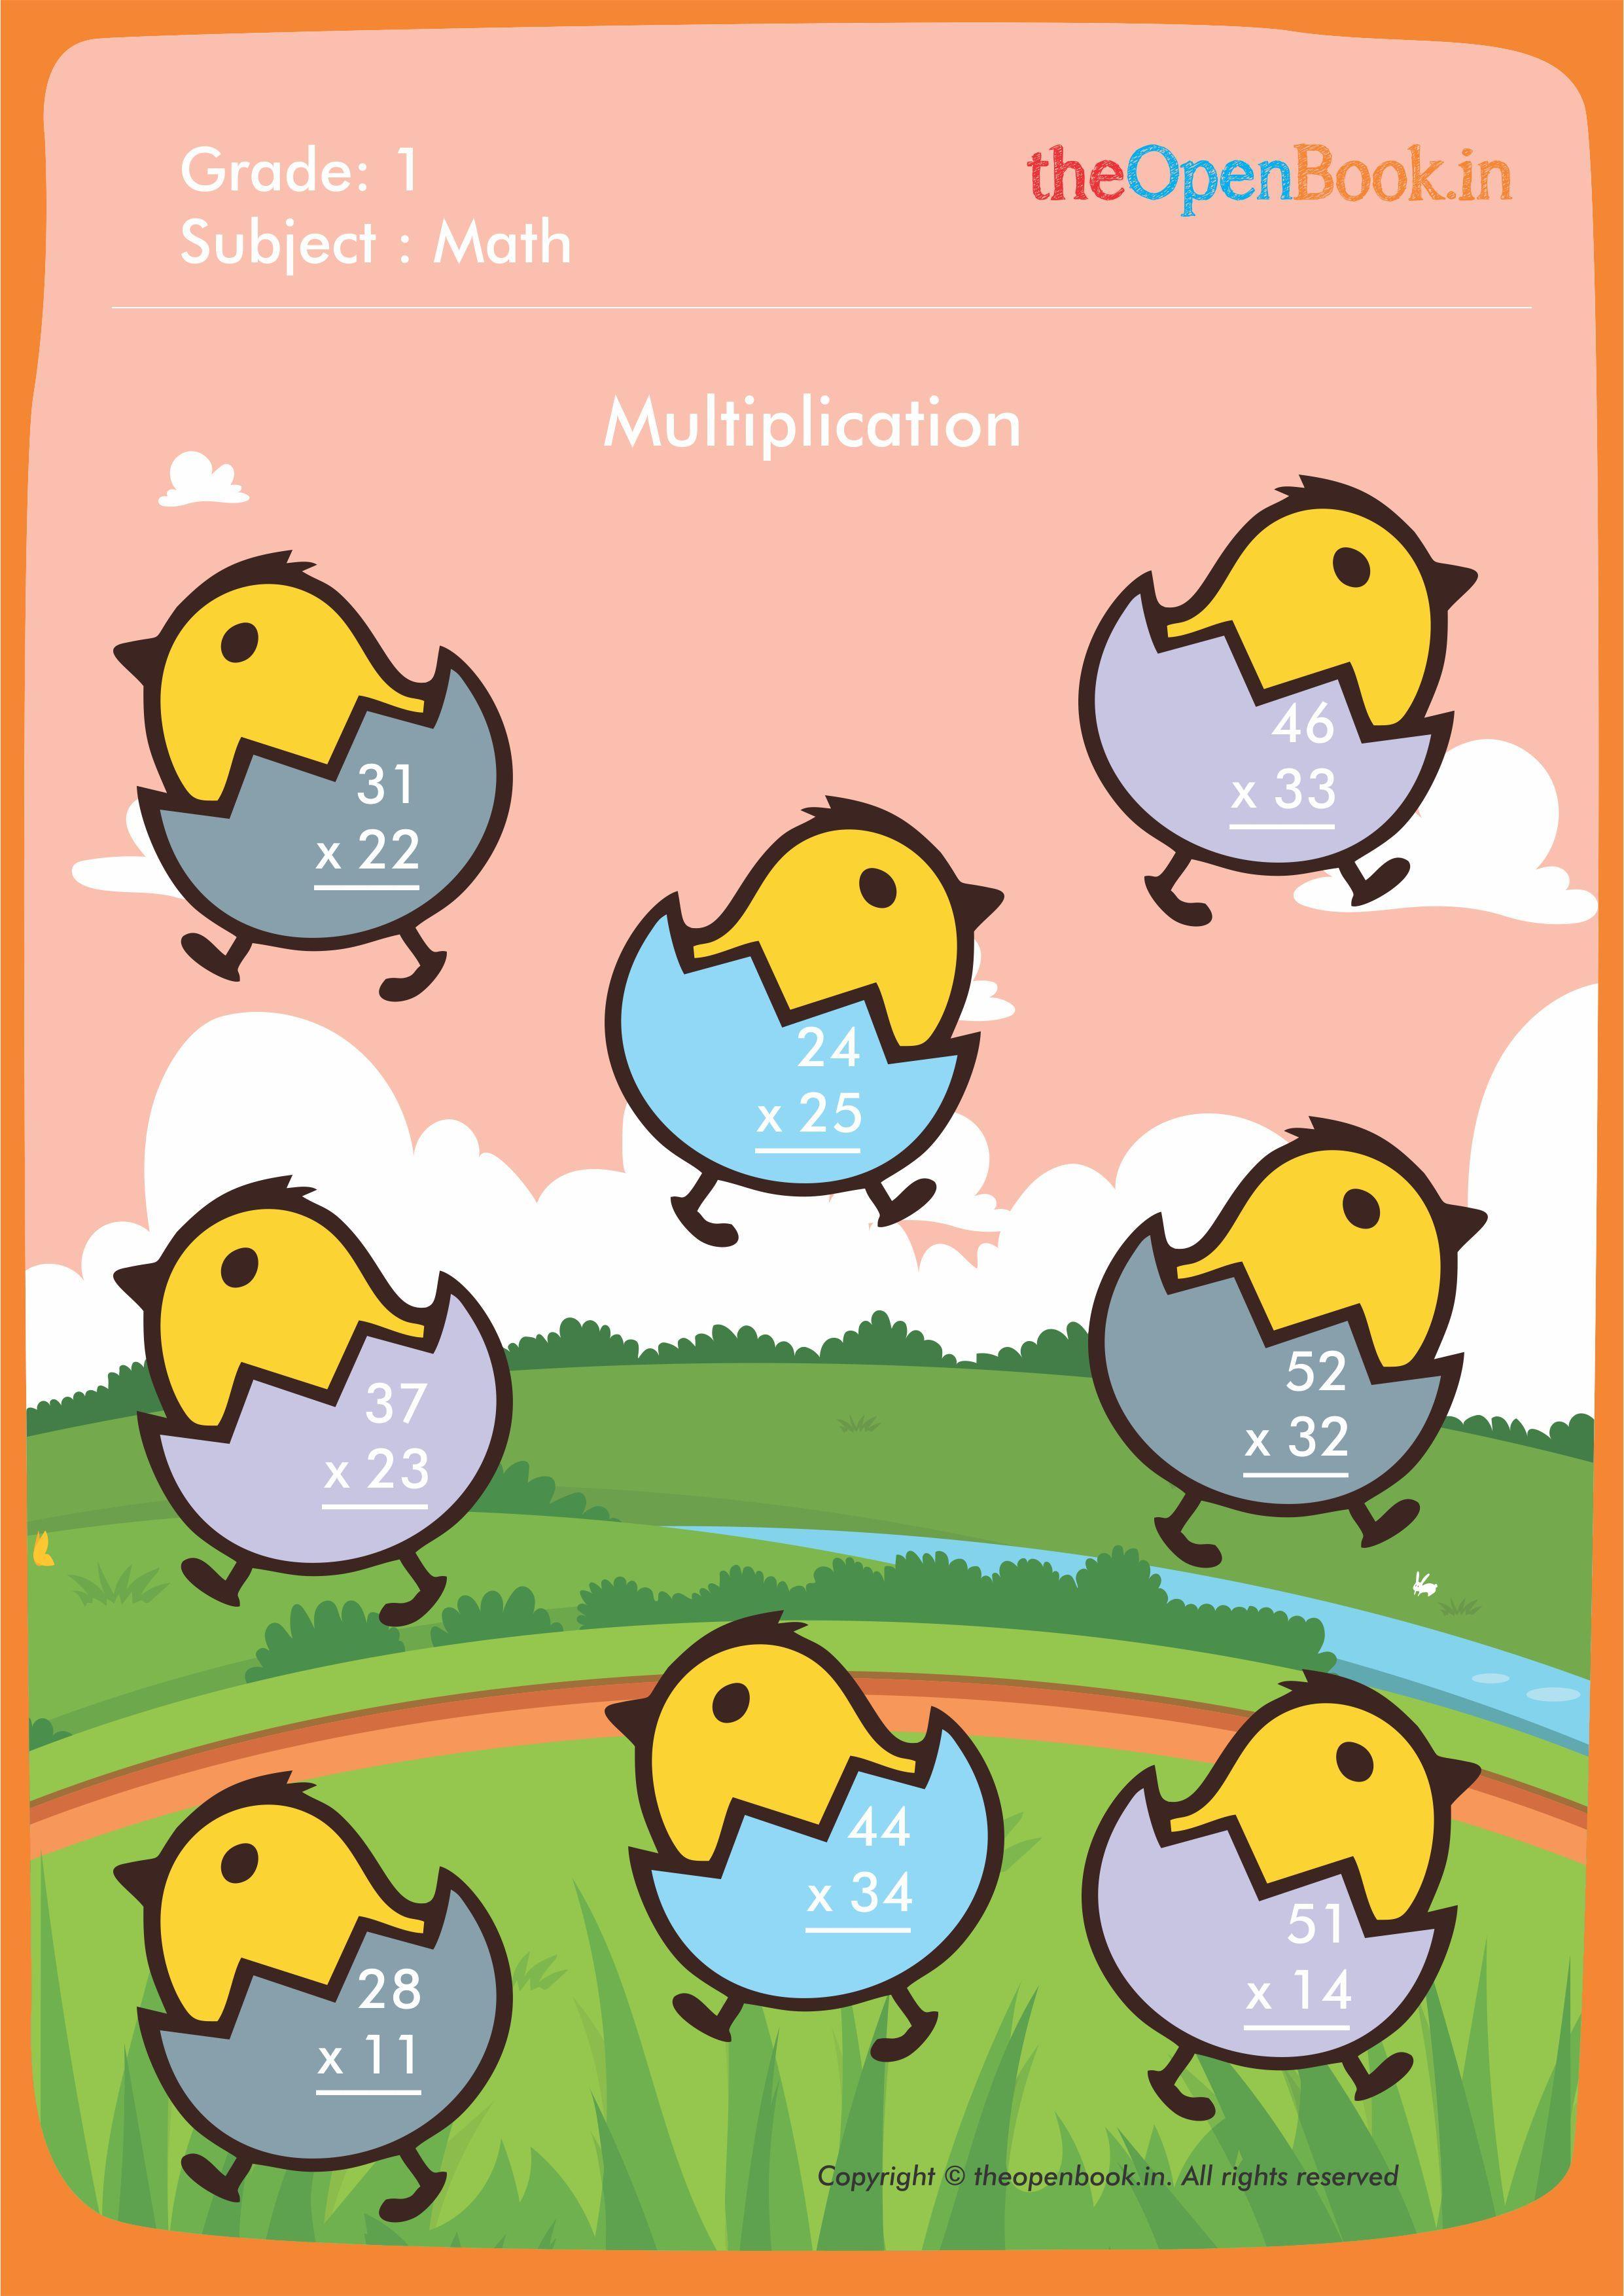 Theopenbook Create Free Multiplication Printable School